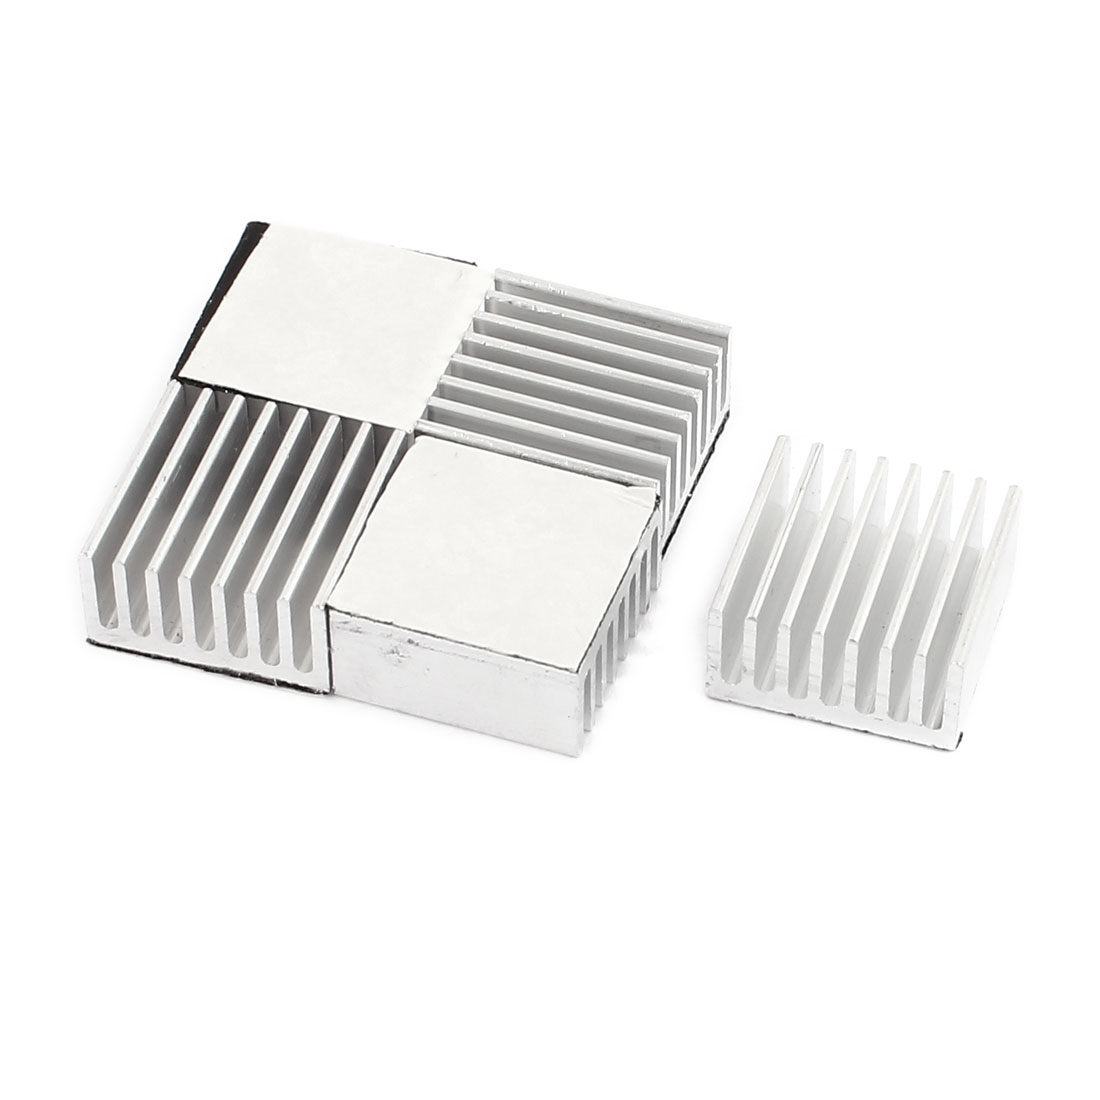 5 Pcs Aluminum Radiator Heatsink Cooling Fin Silver Tone 20 x 20 x 10mm for CPU